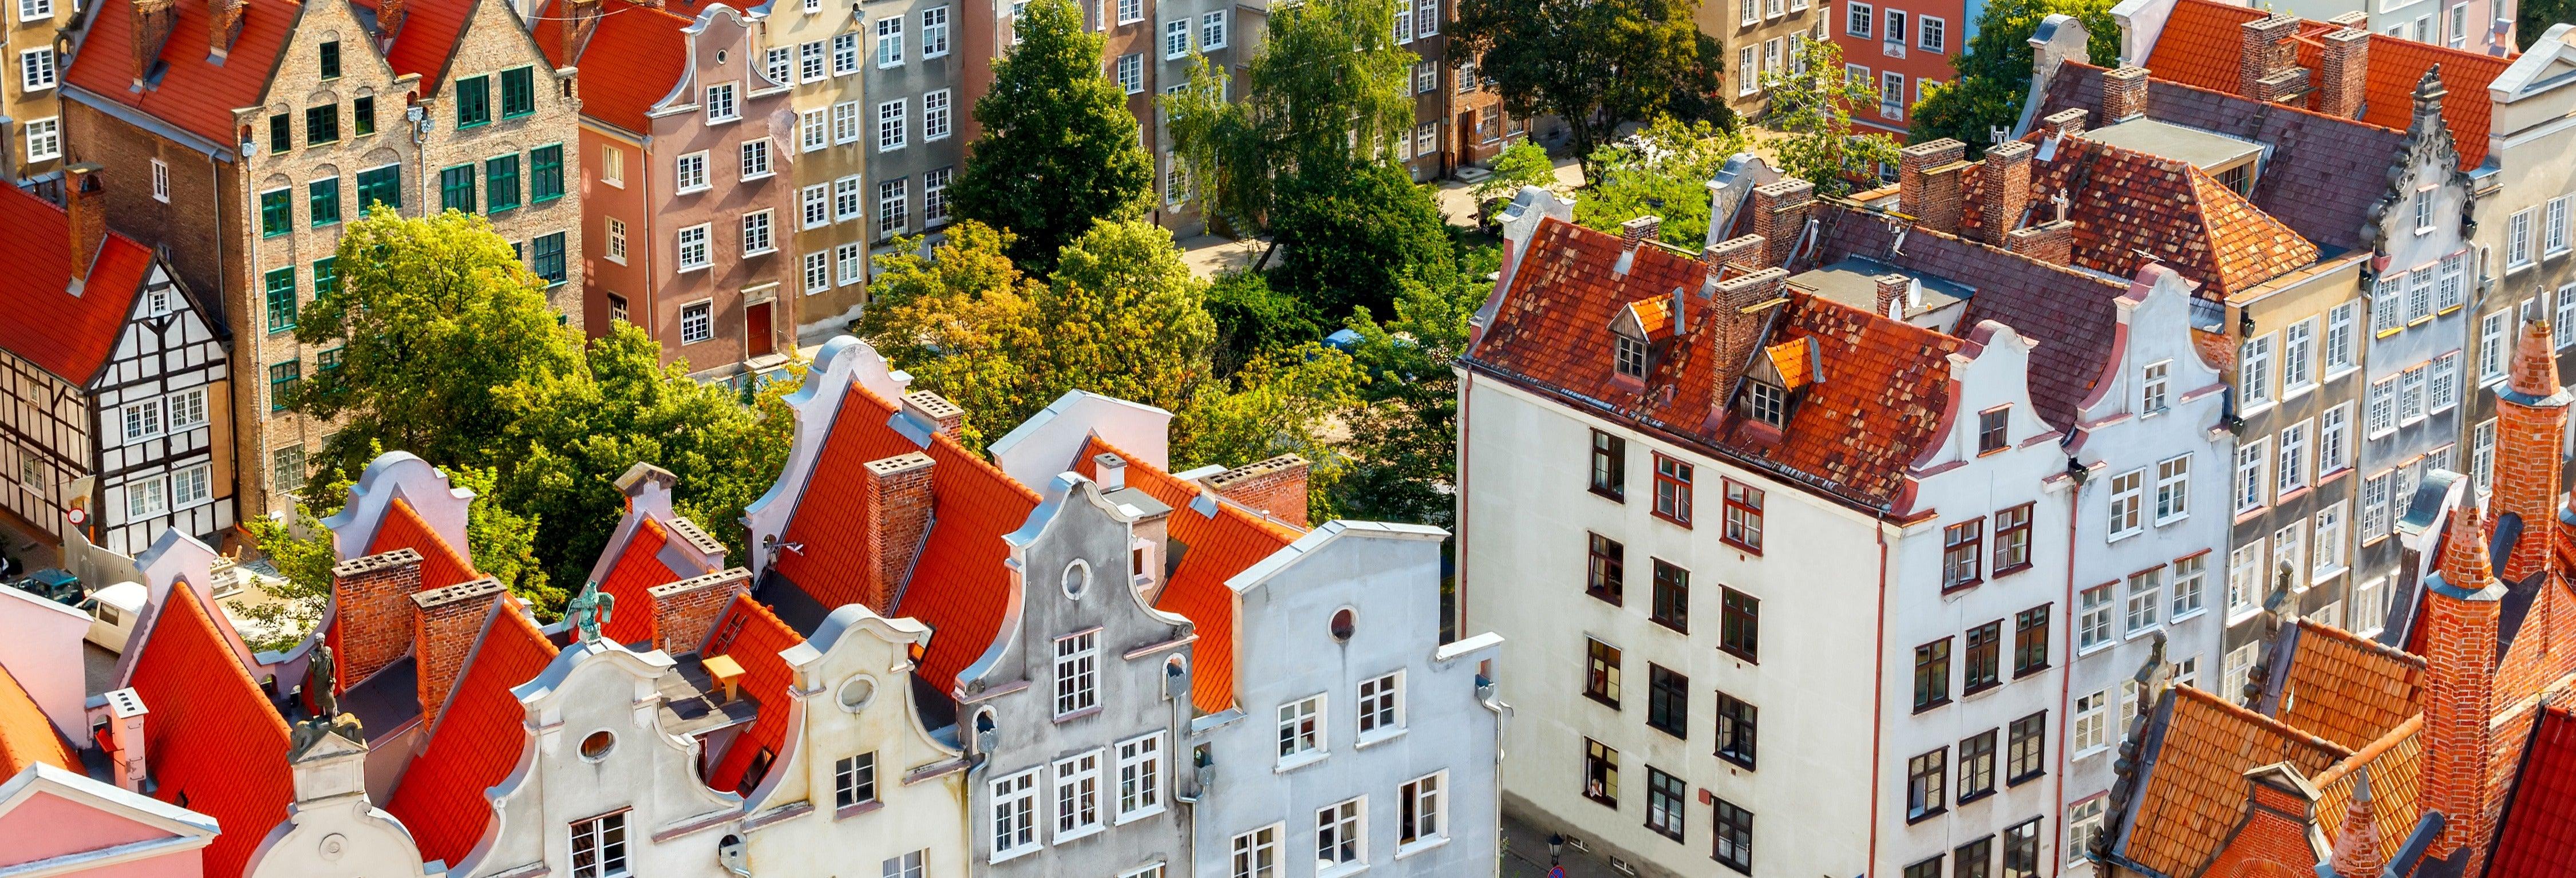 Tour privado por Gdansk con guía en español